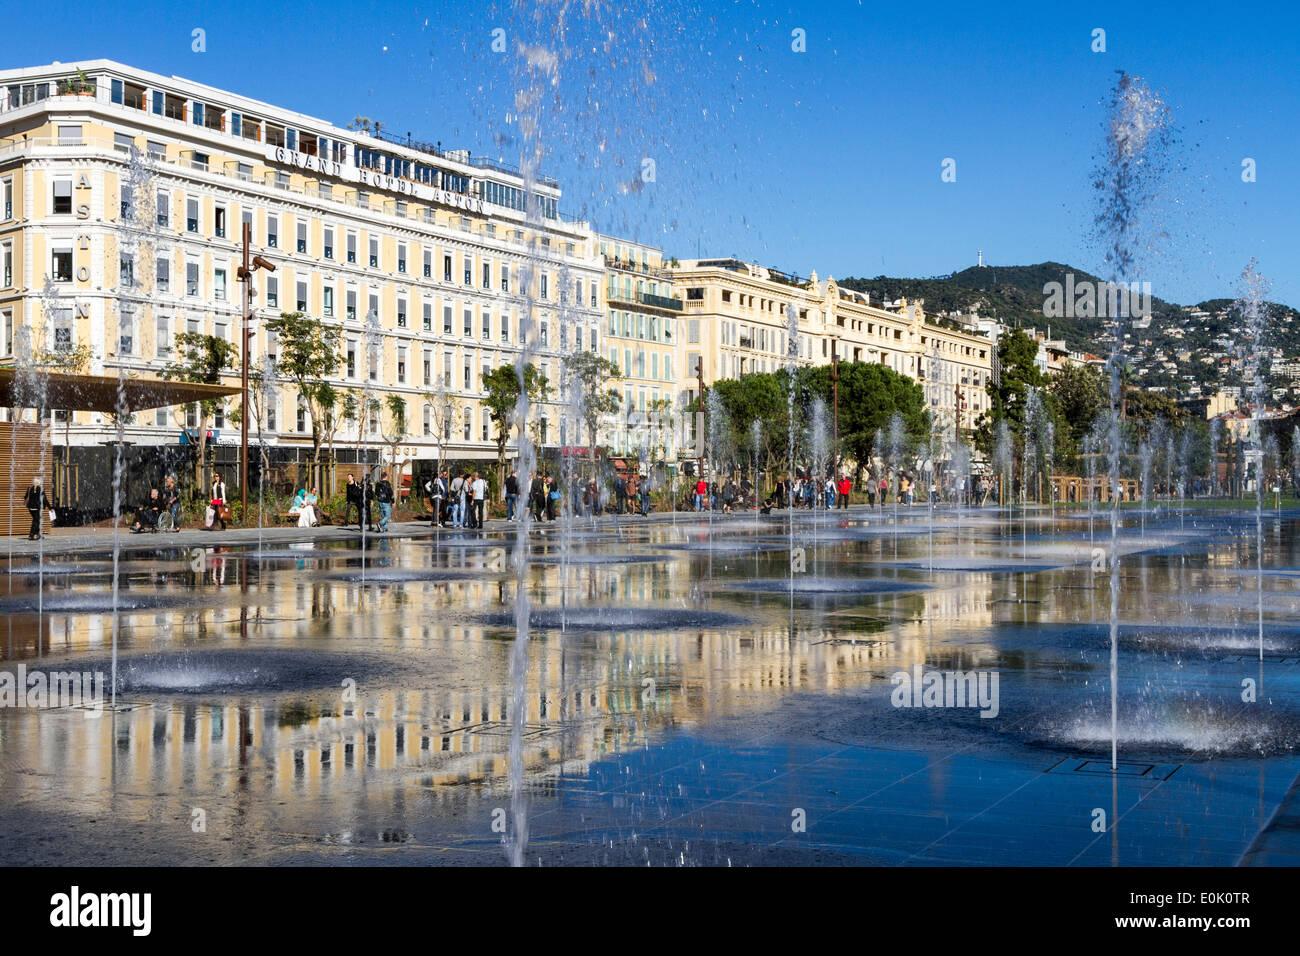 Miroir d'Eau, Espace, Massena Nizza Cote d'Azur, in Francia Immagini Stock